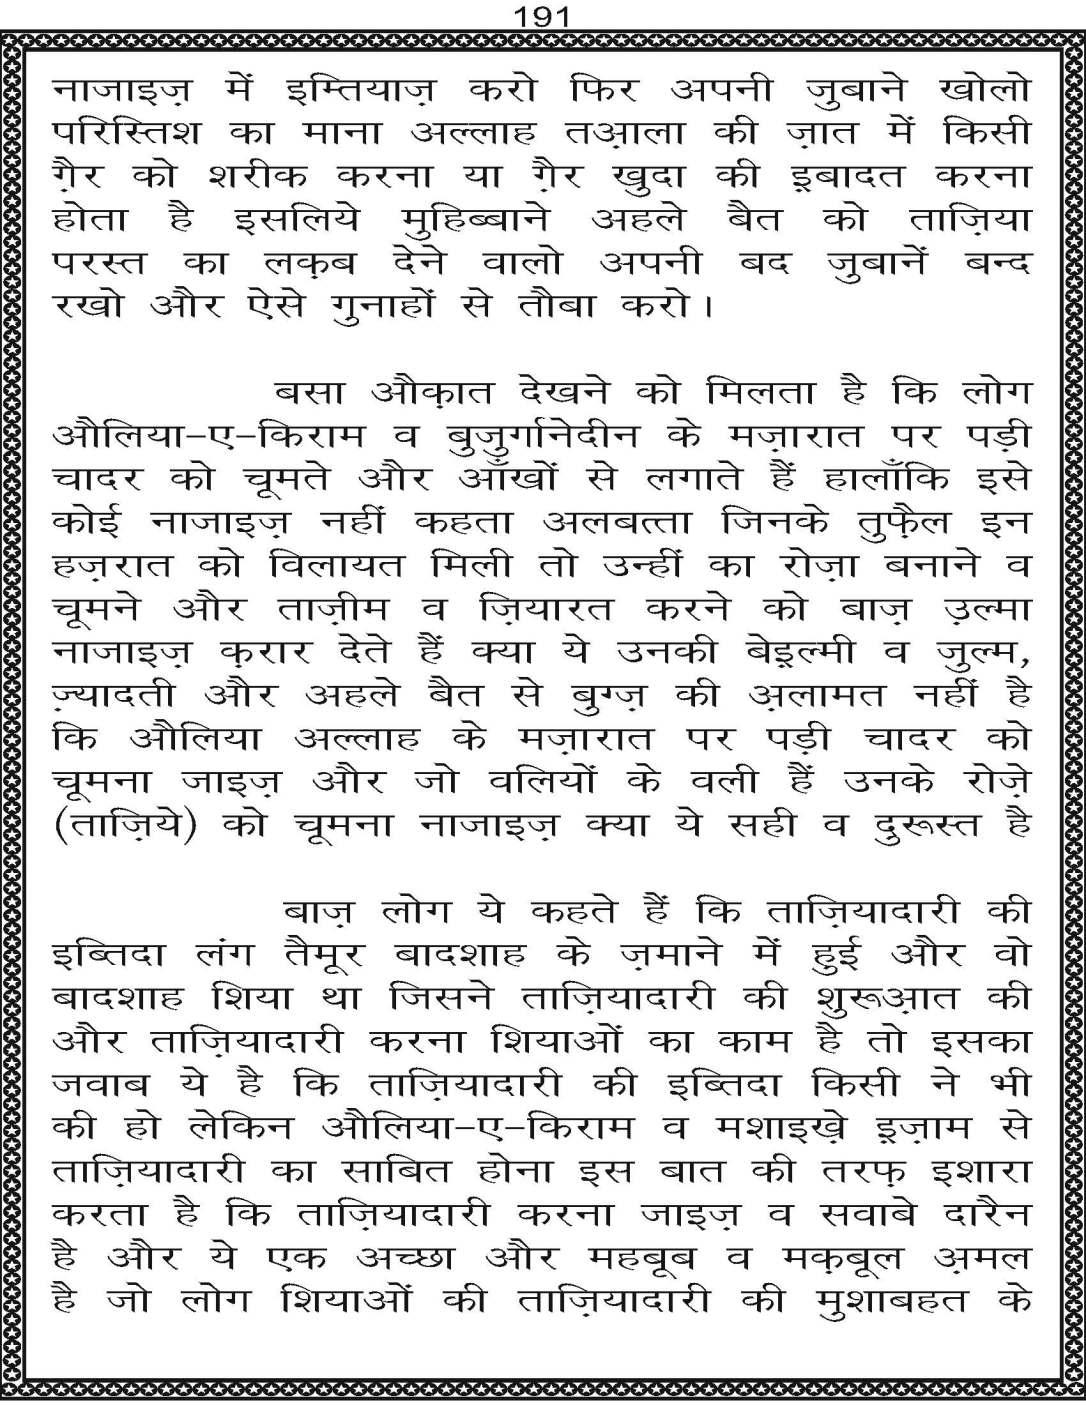 AzmateTaziyadari_Page_191